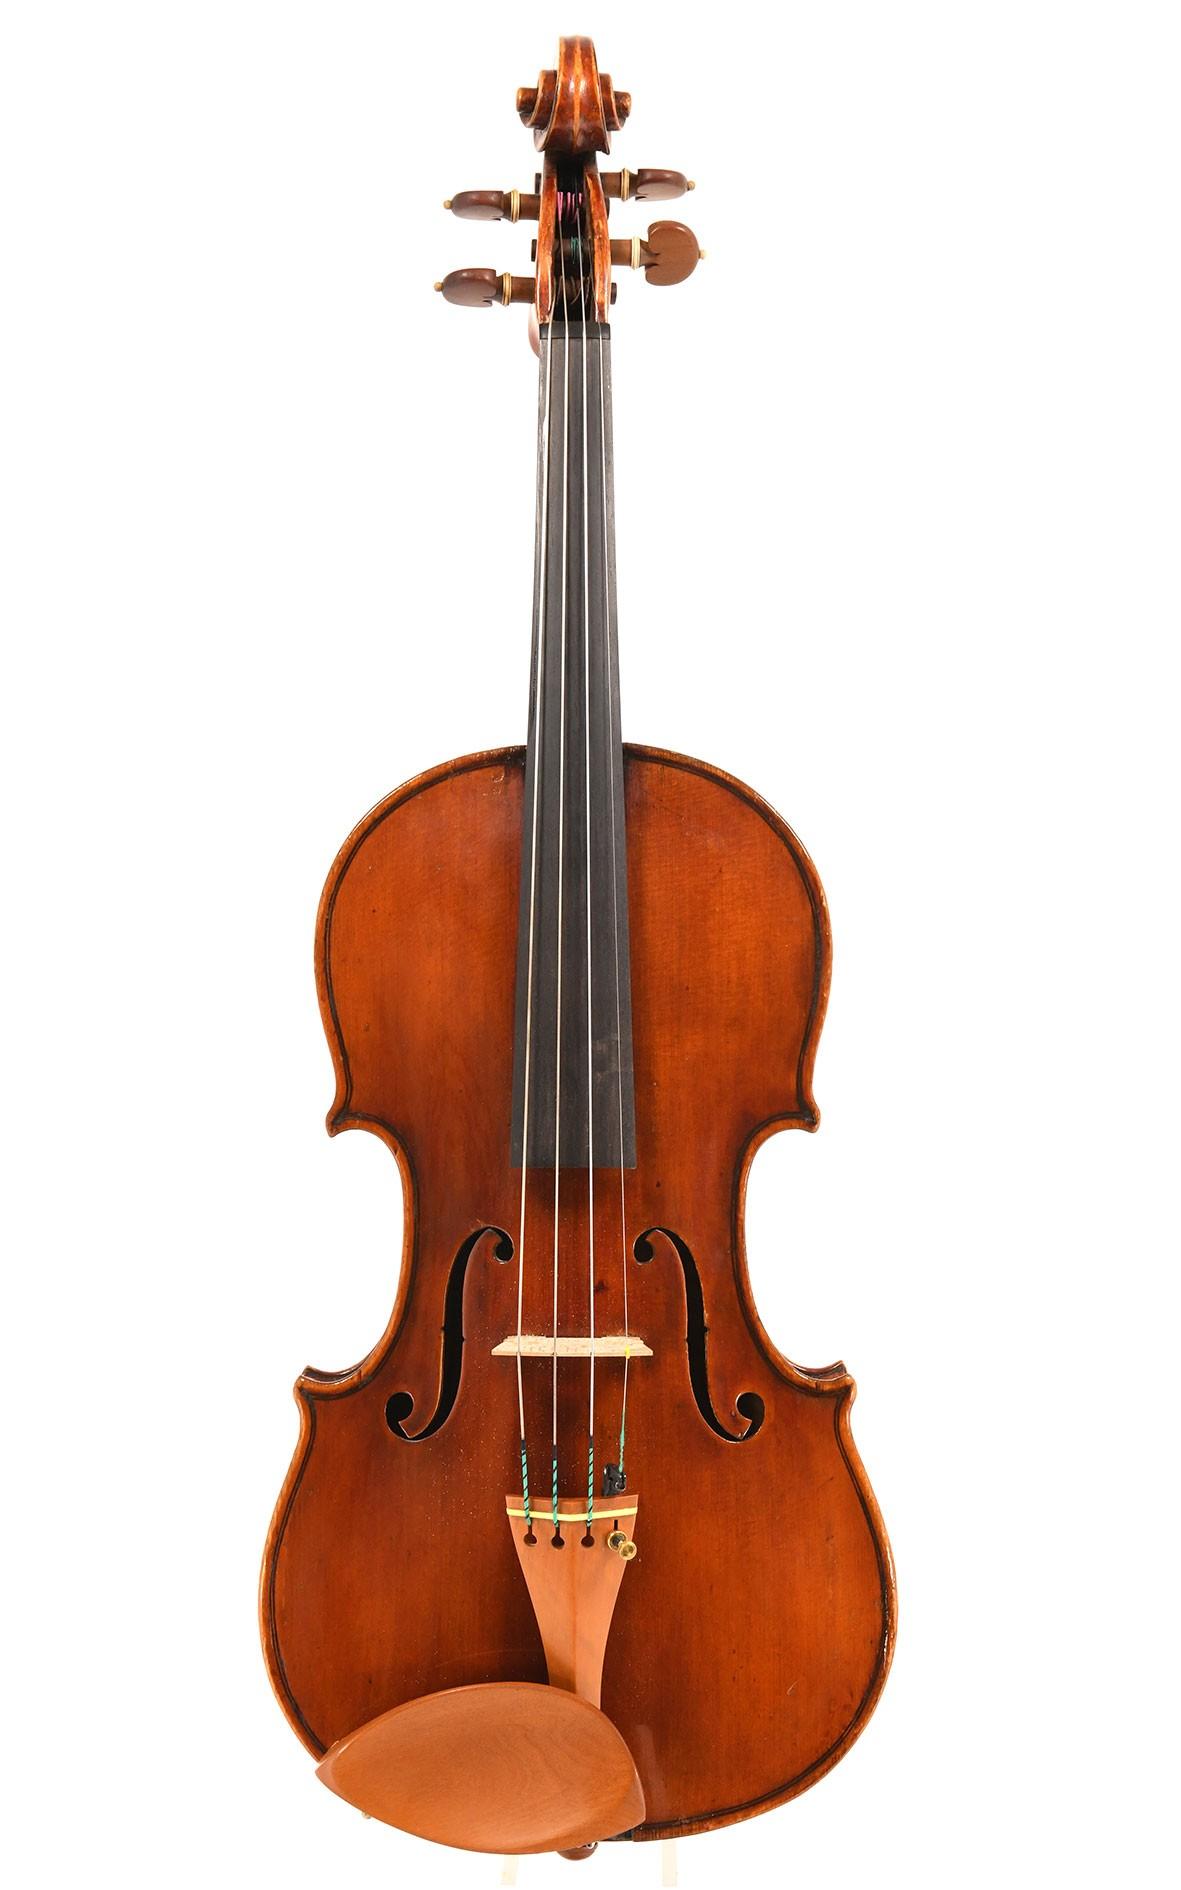 Feine italienische Geige (Zertifikat Carlson & Neumann)